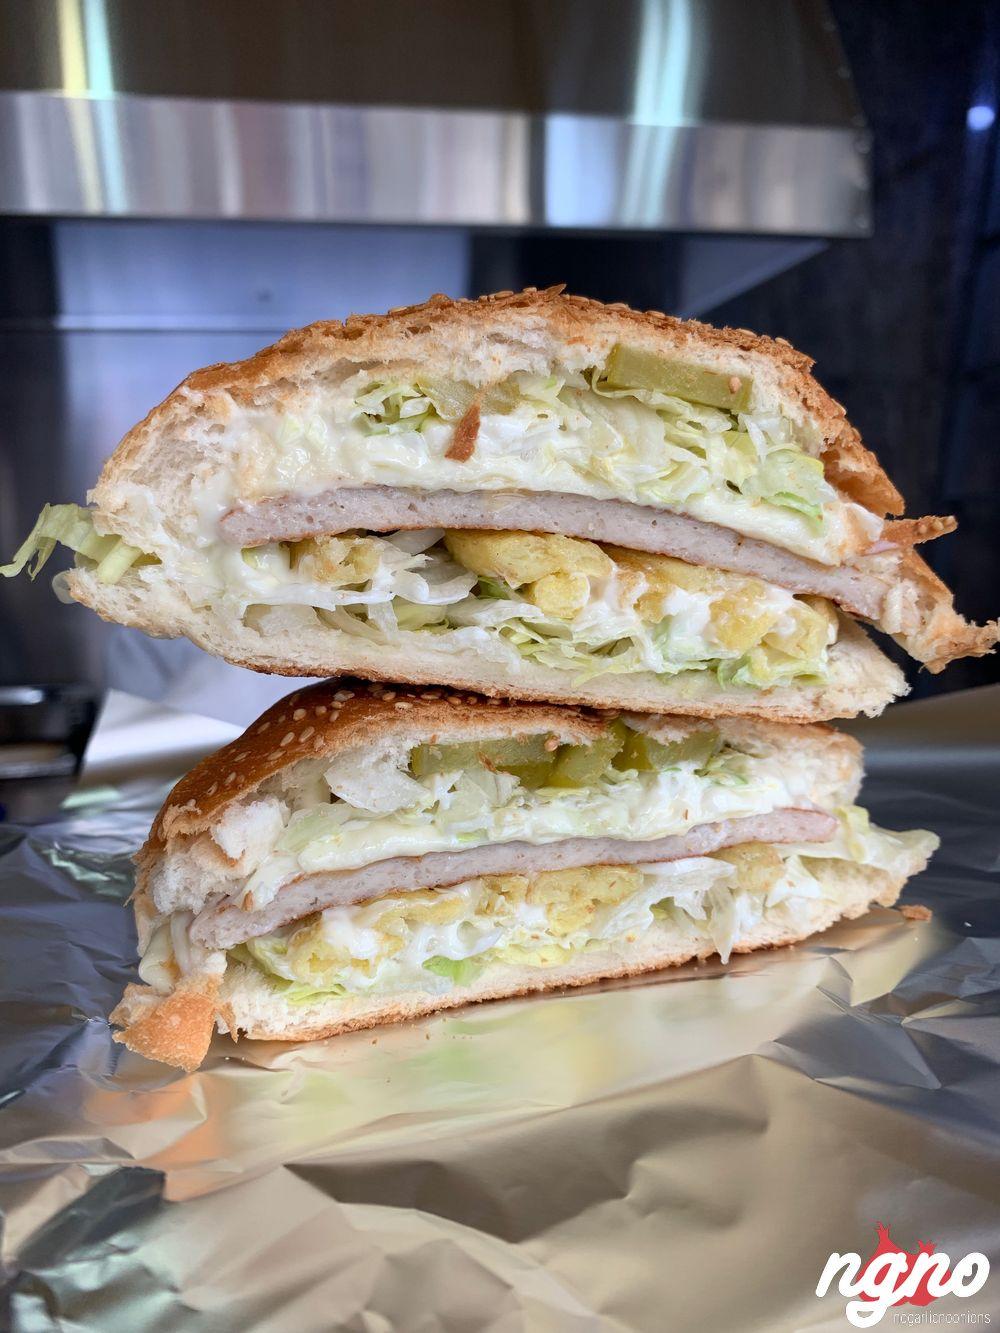 j-makhlouf-dora-sandwiches-nogarlicnoonions-502019-02-22-09-49-37